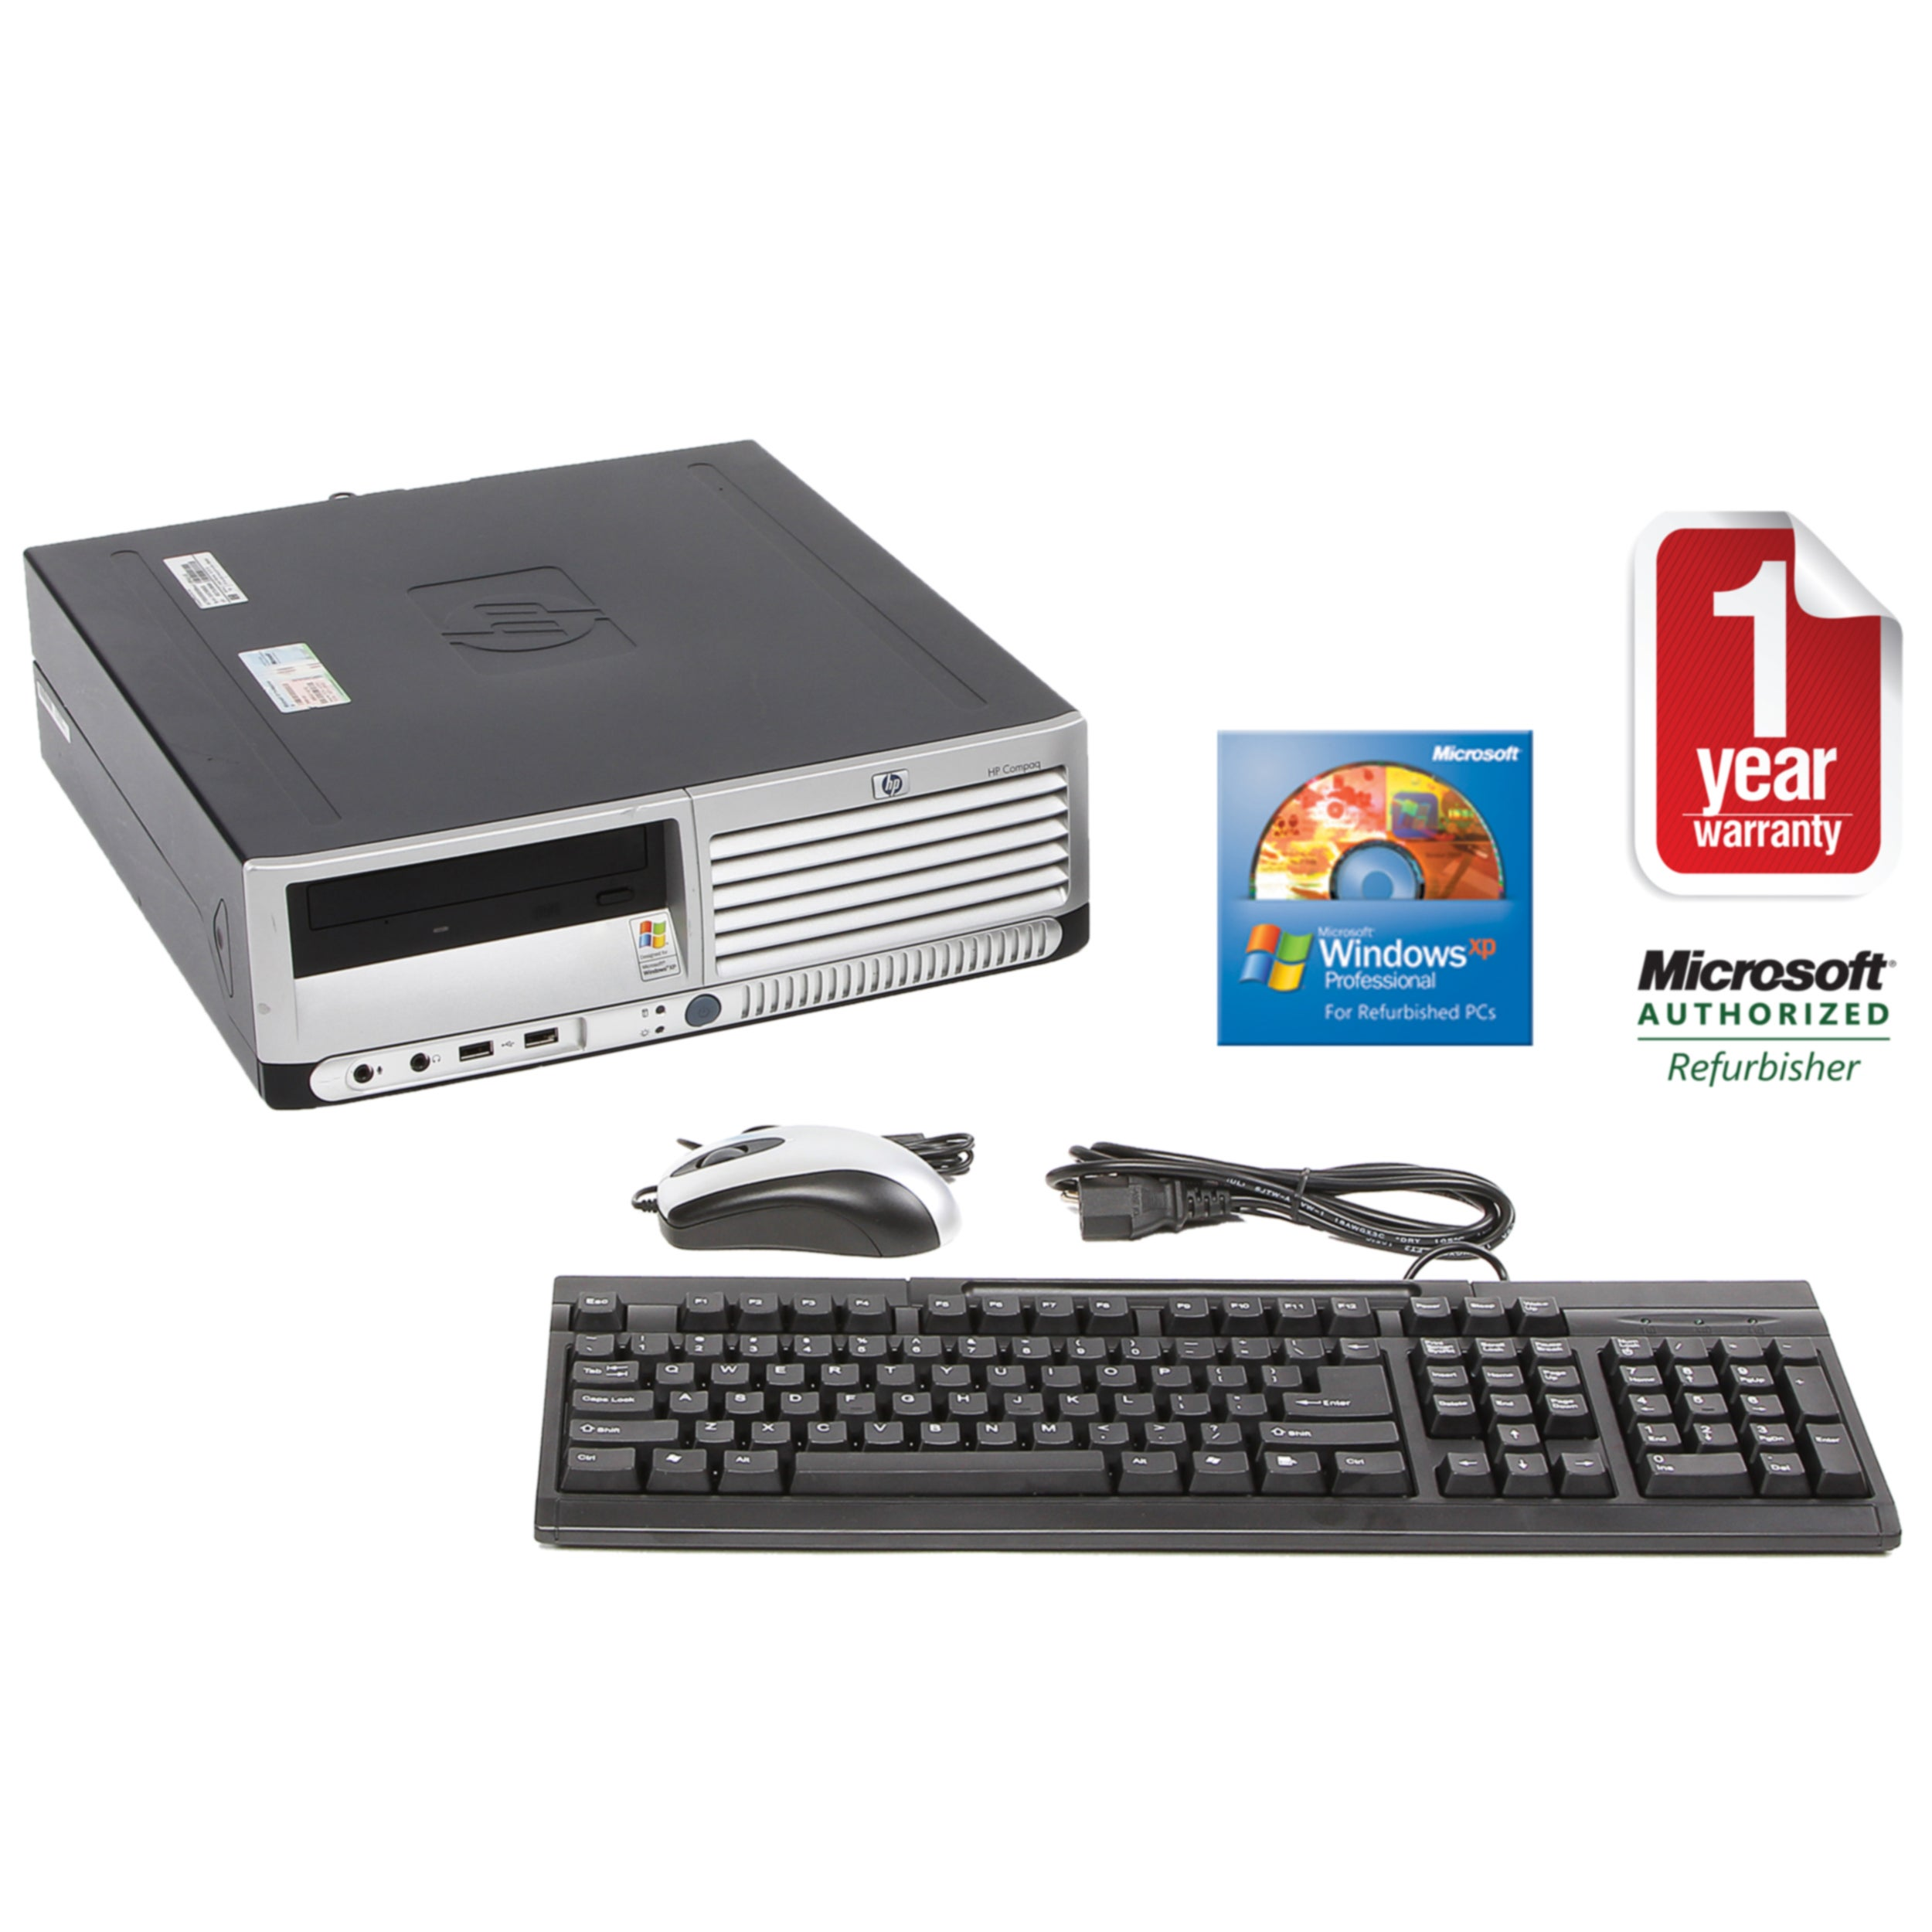 HP Compaq DC5100 3.06GHz 80GB SFF Computer (Refurbished)